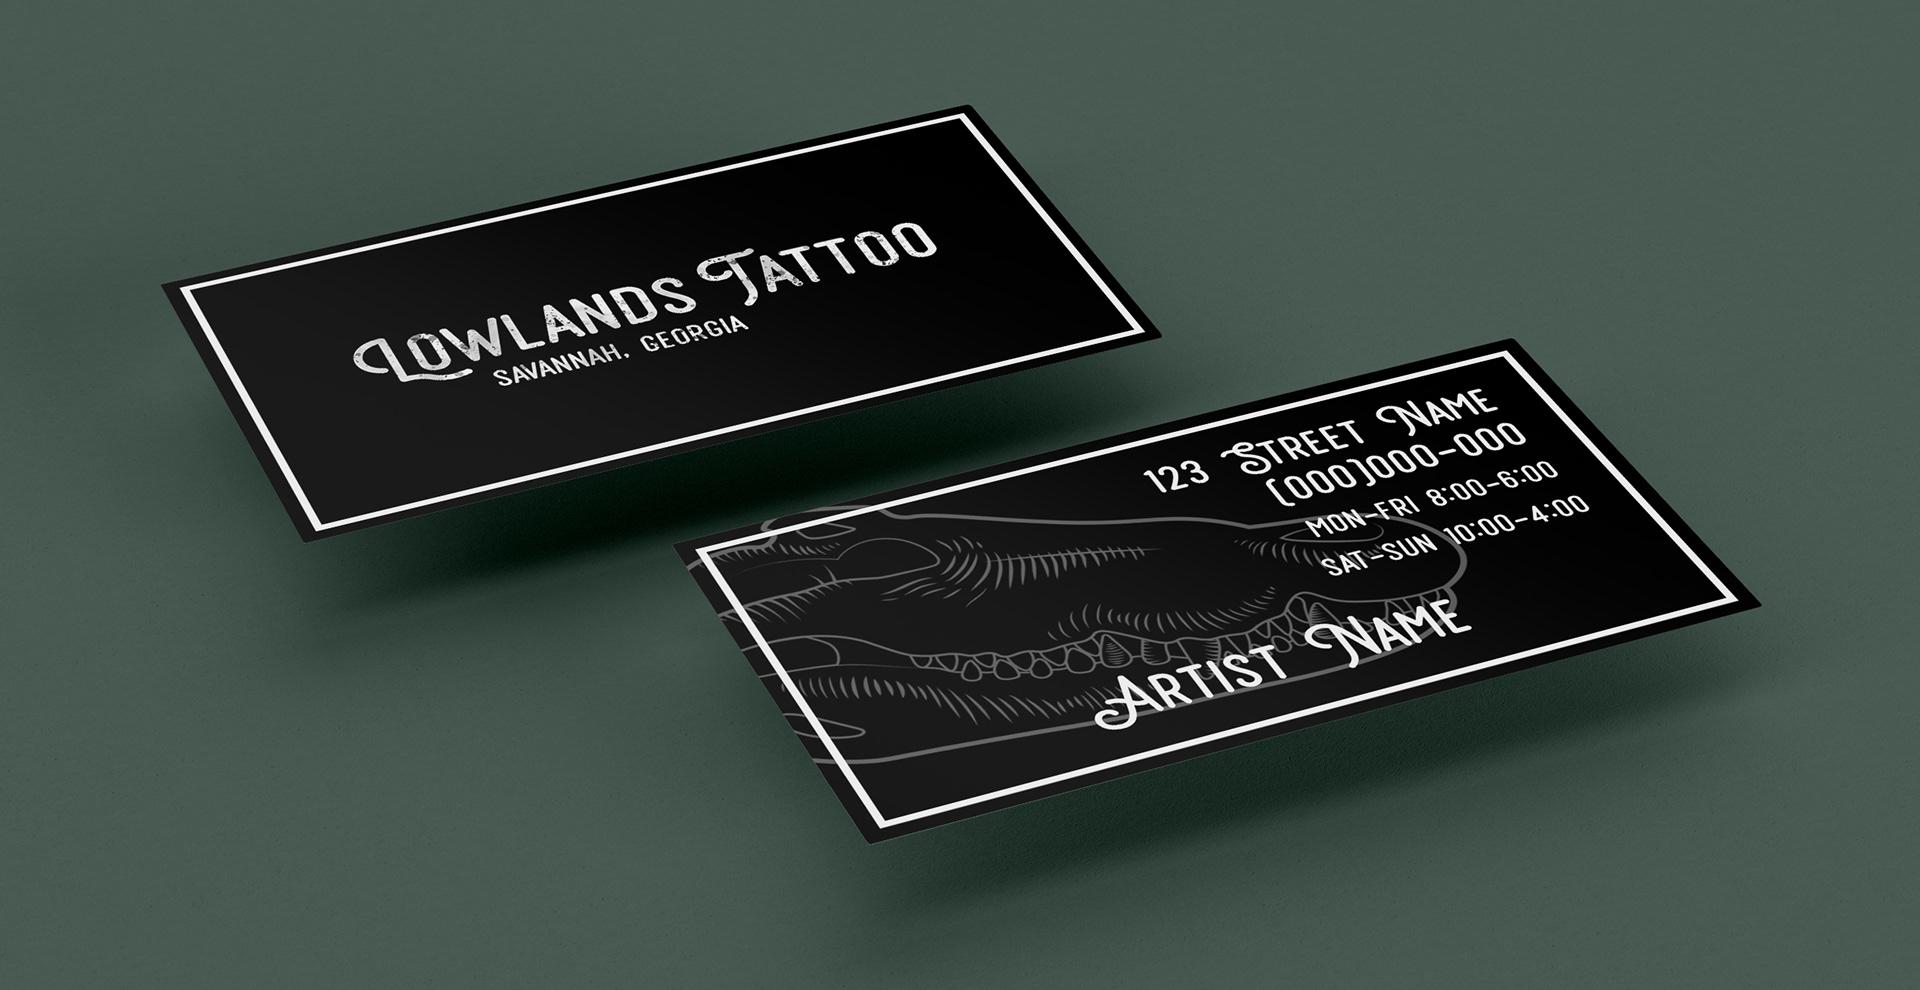 Mclean Carrington Lowlands Tattoo Shop Business Identity Concept